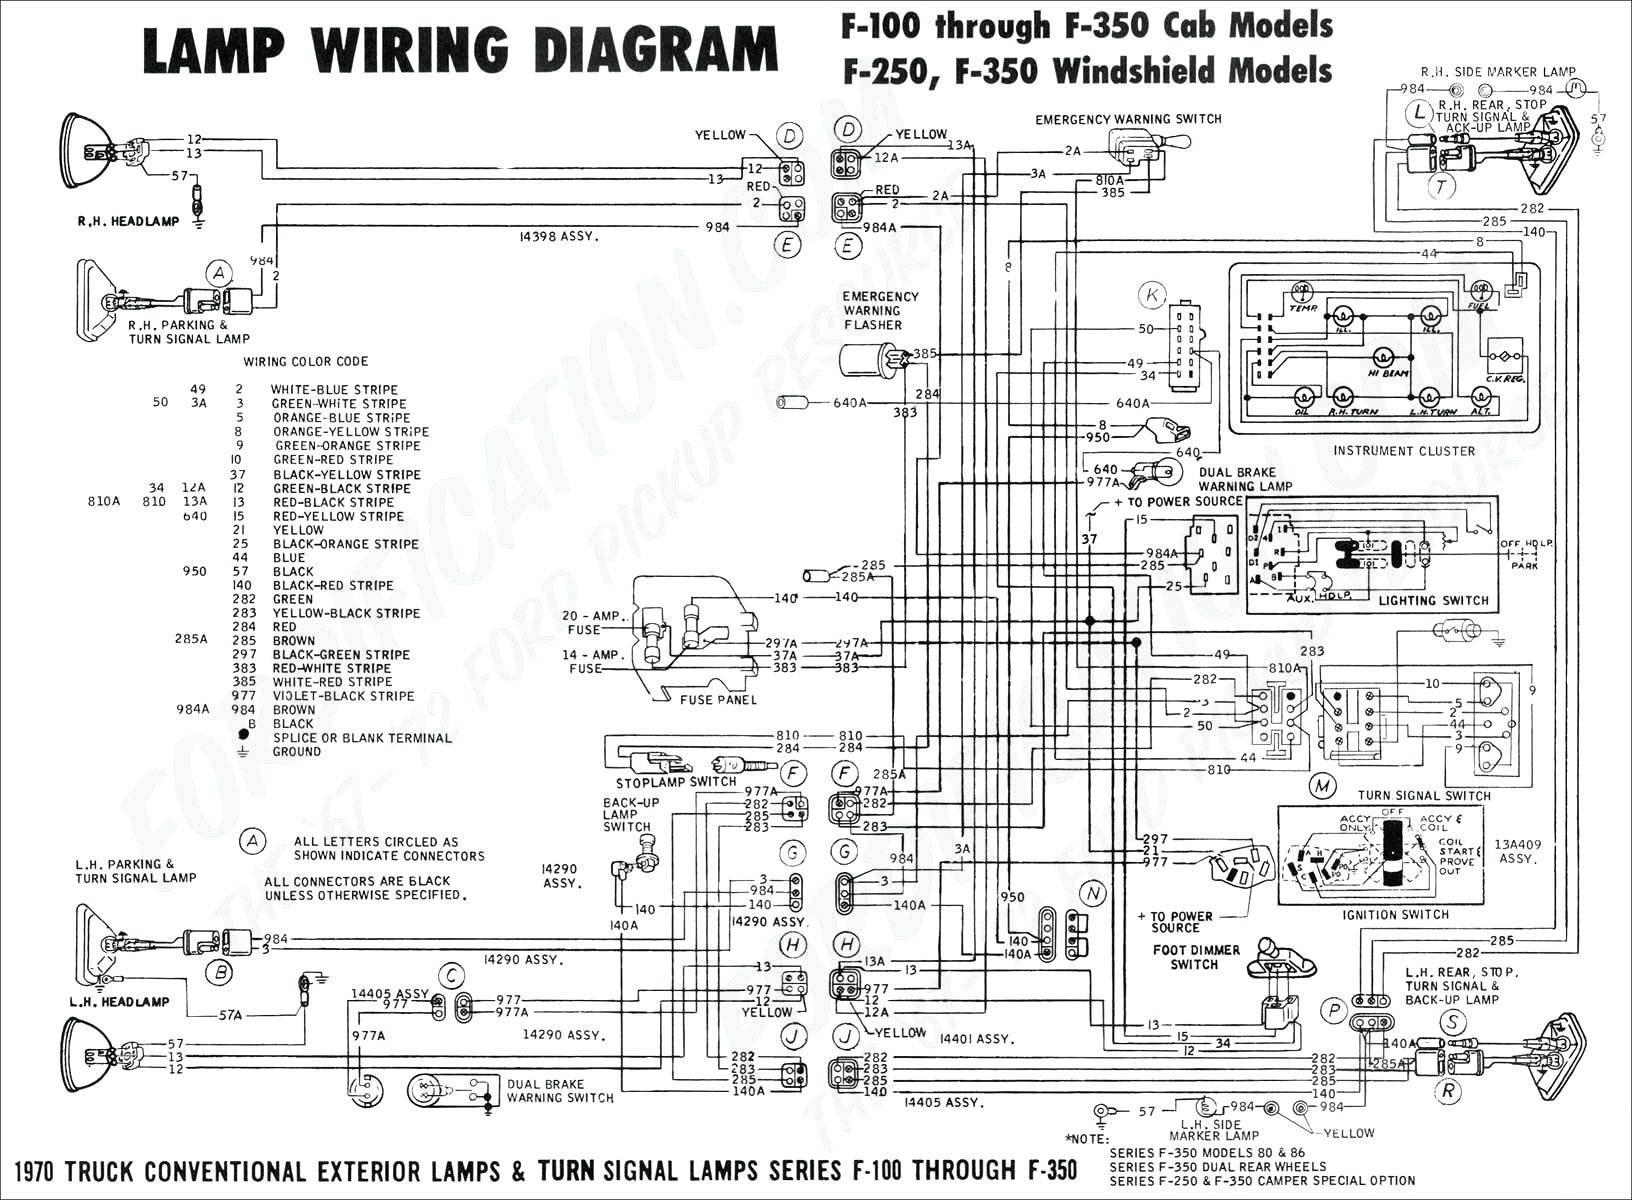 1999 dodge stratus wiring diagrams